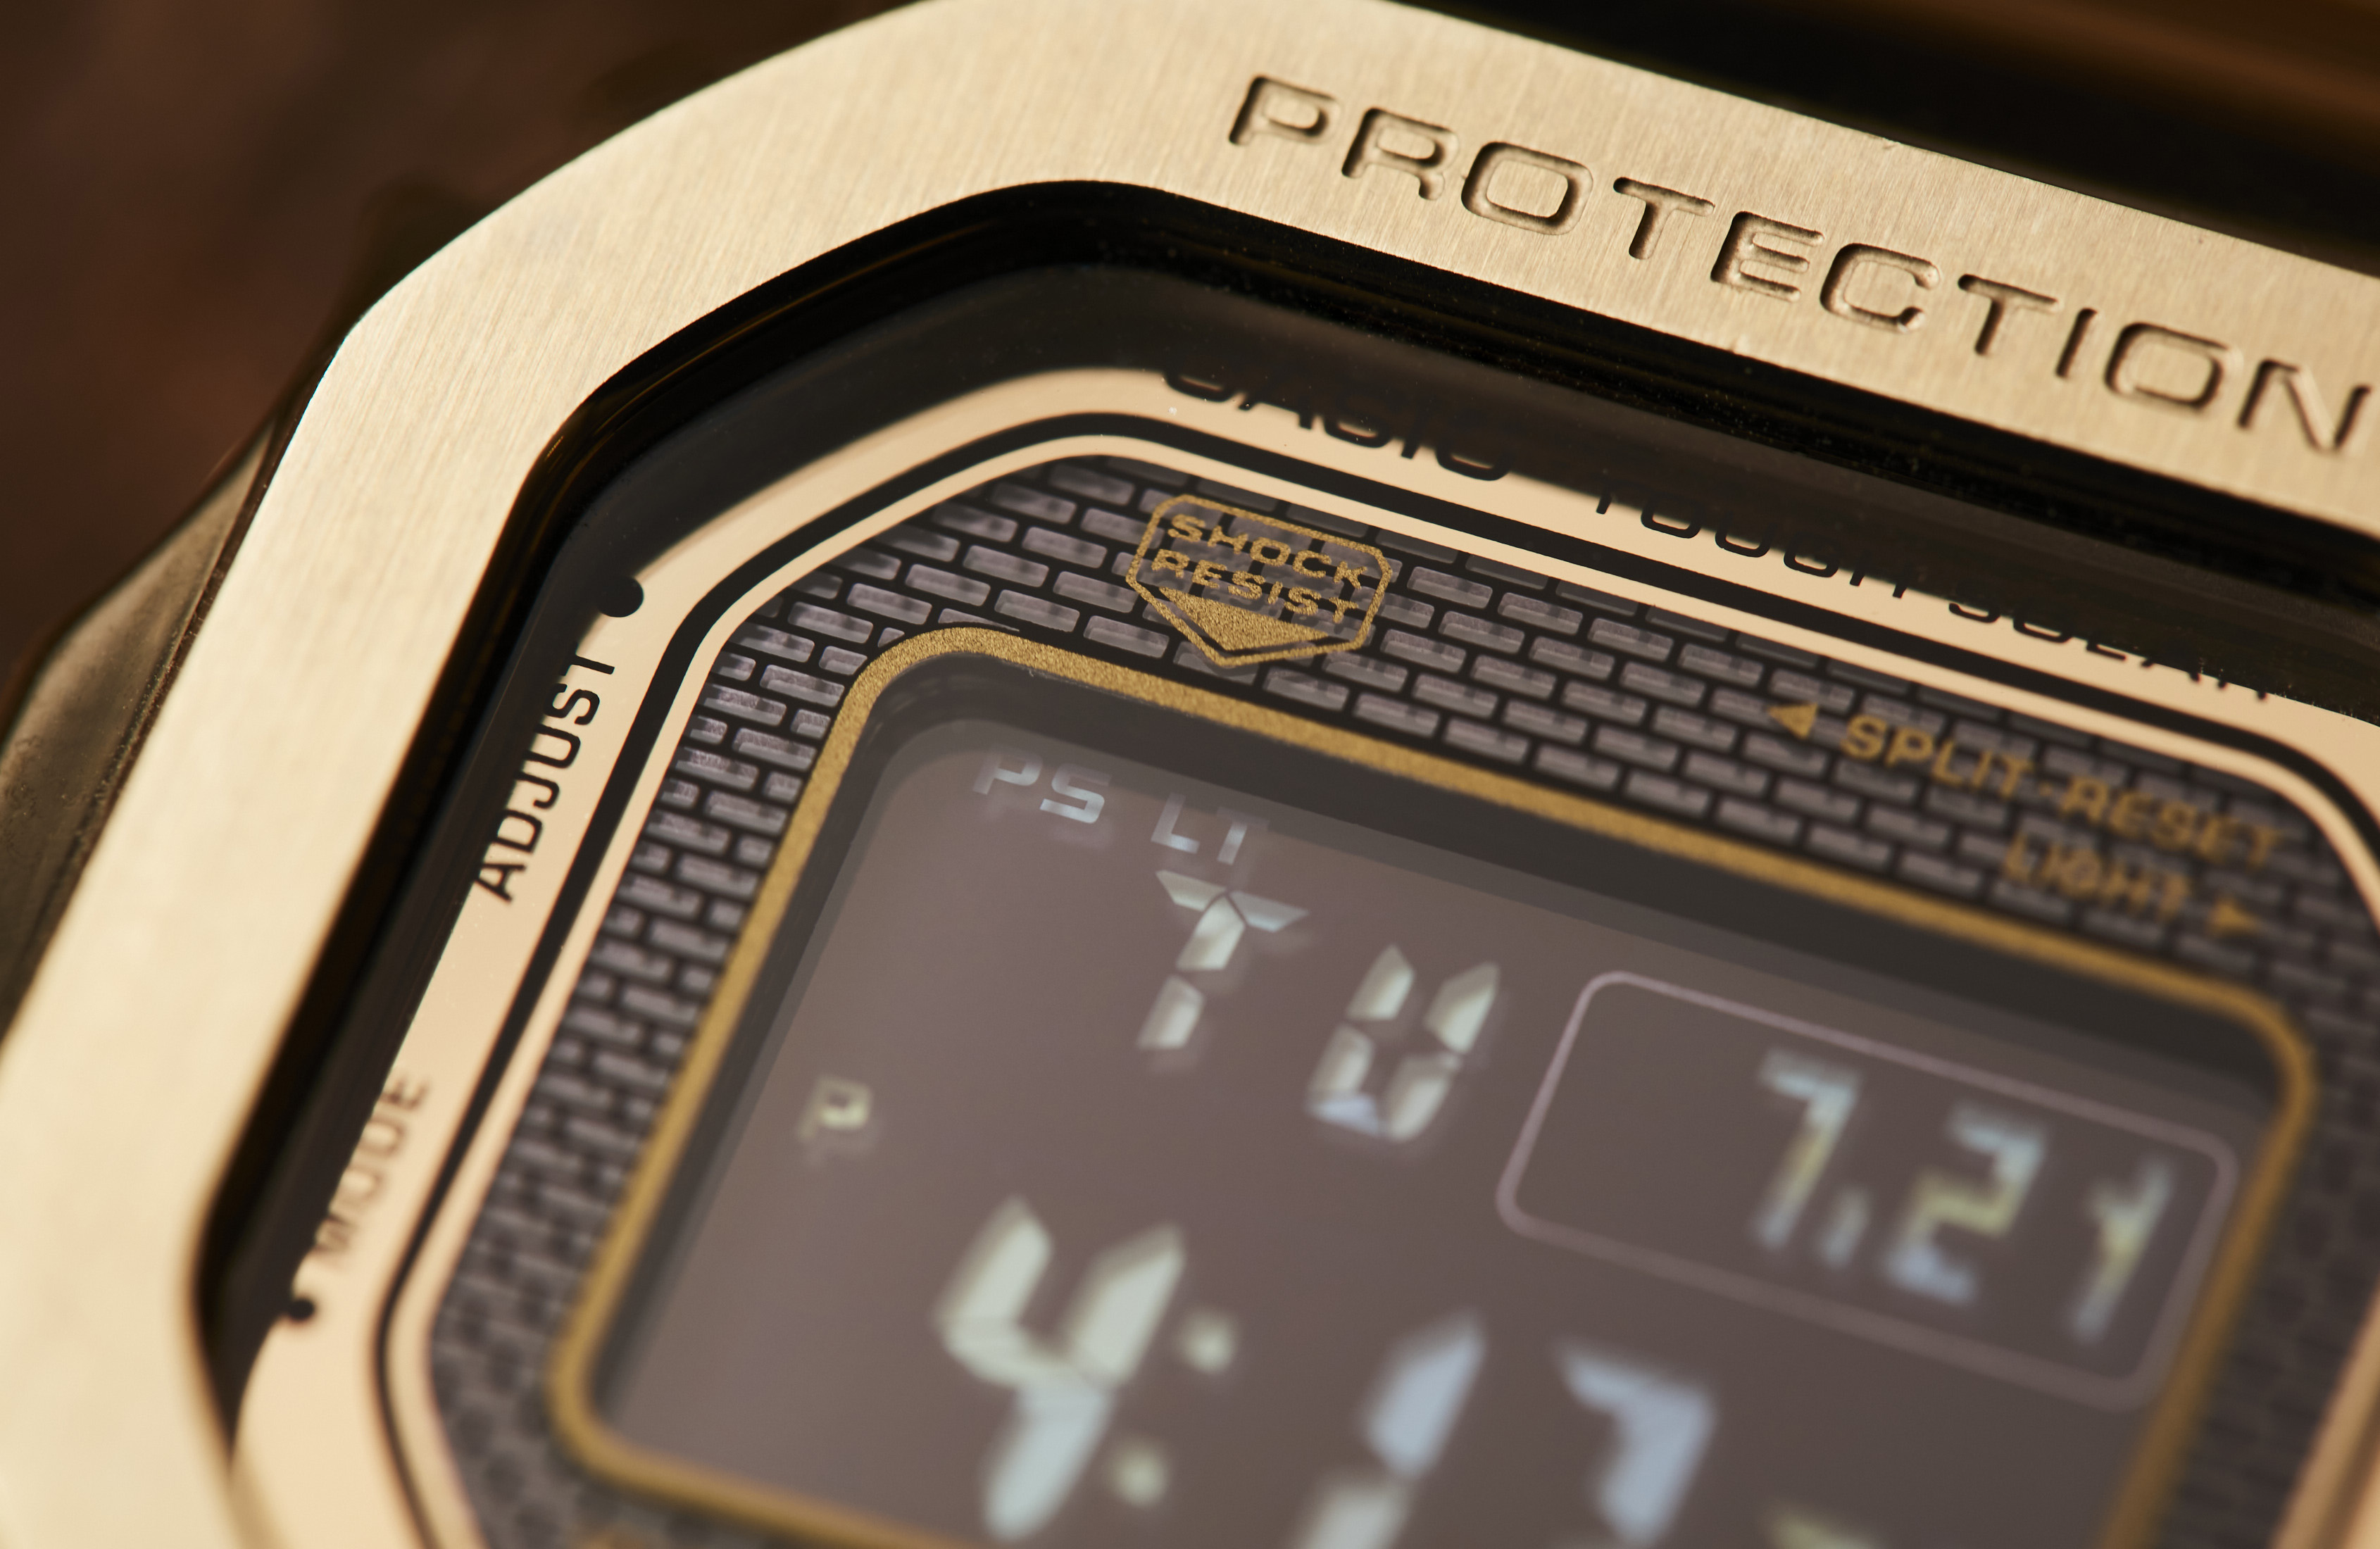 Casio G-Shock Full Metal GMW-B5000GD-9 review